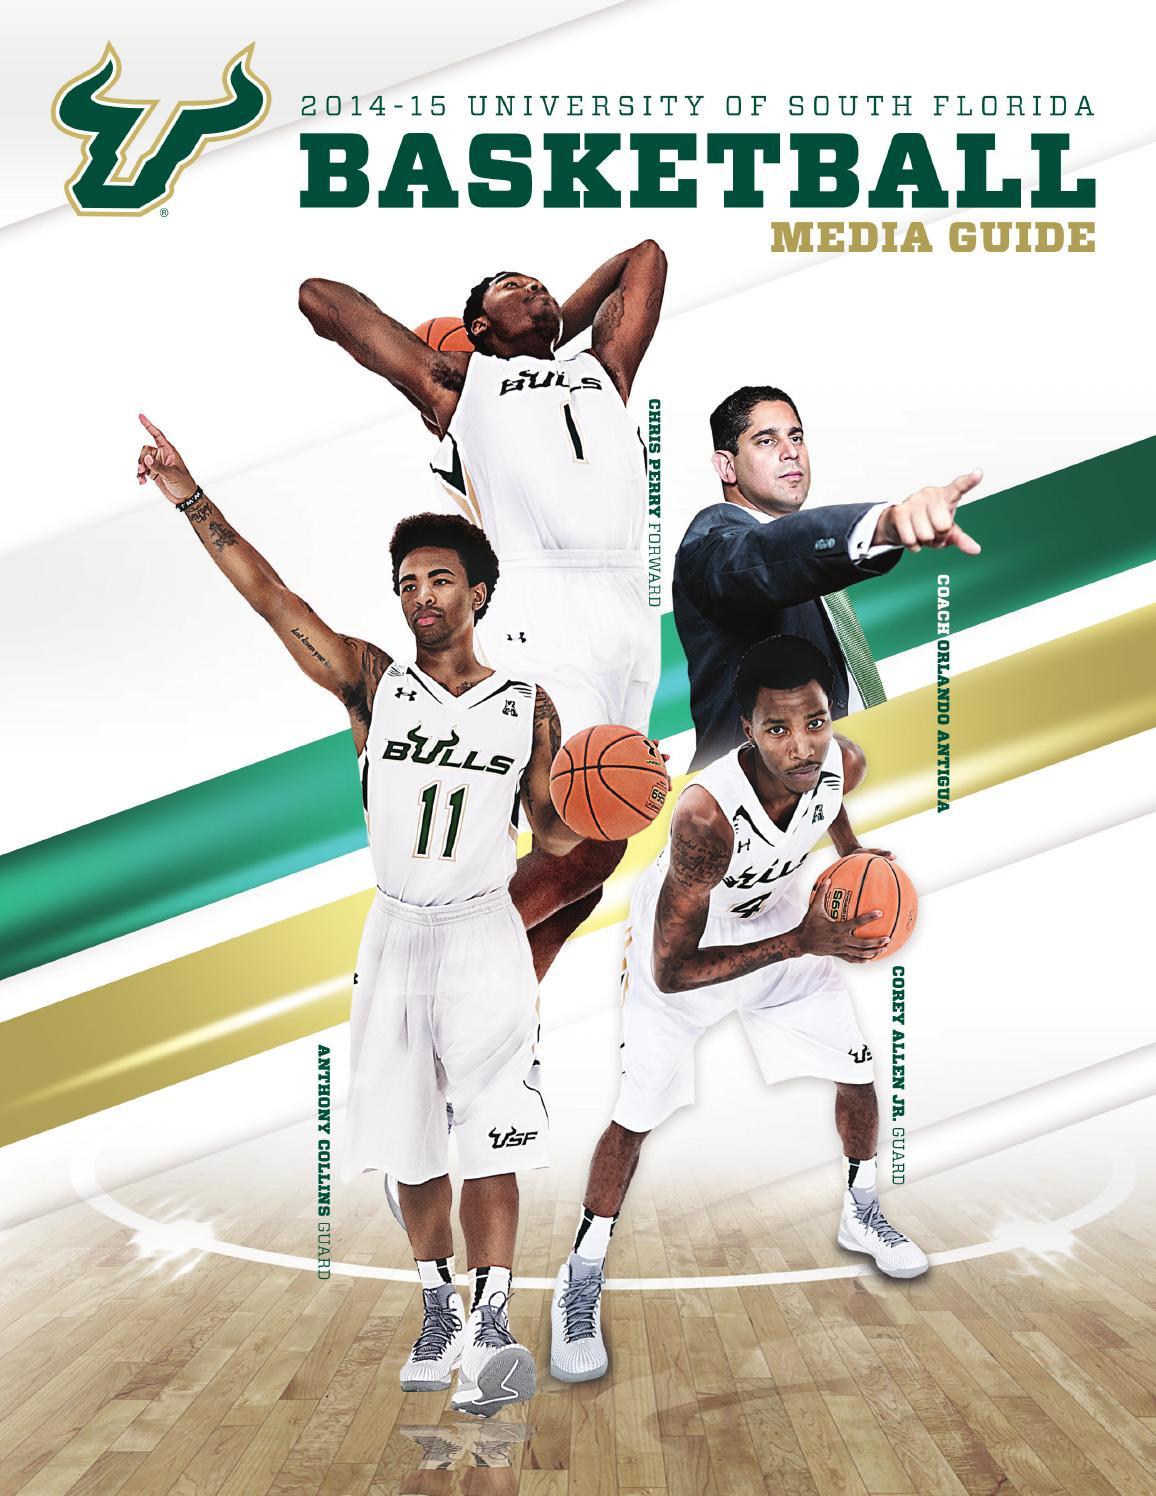 2014-15 USF Men s Basketball Media Guide by USF Bulls - issuu 2ec5b815d